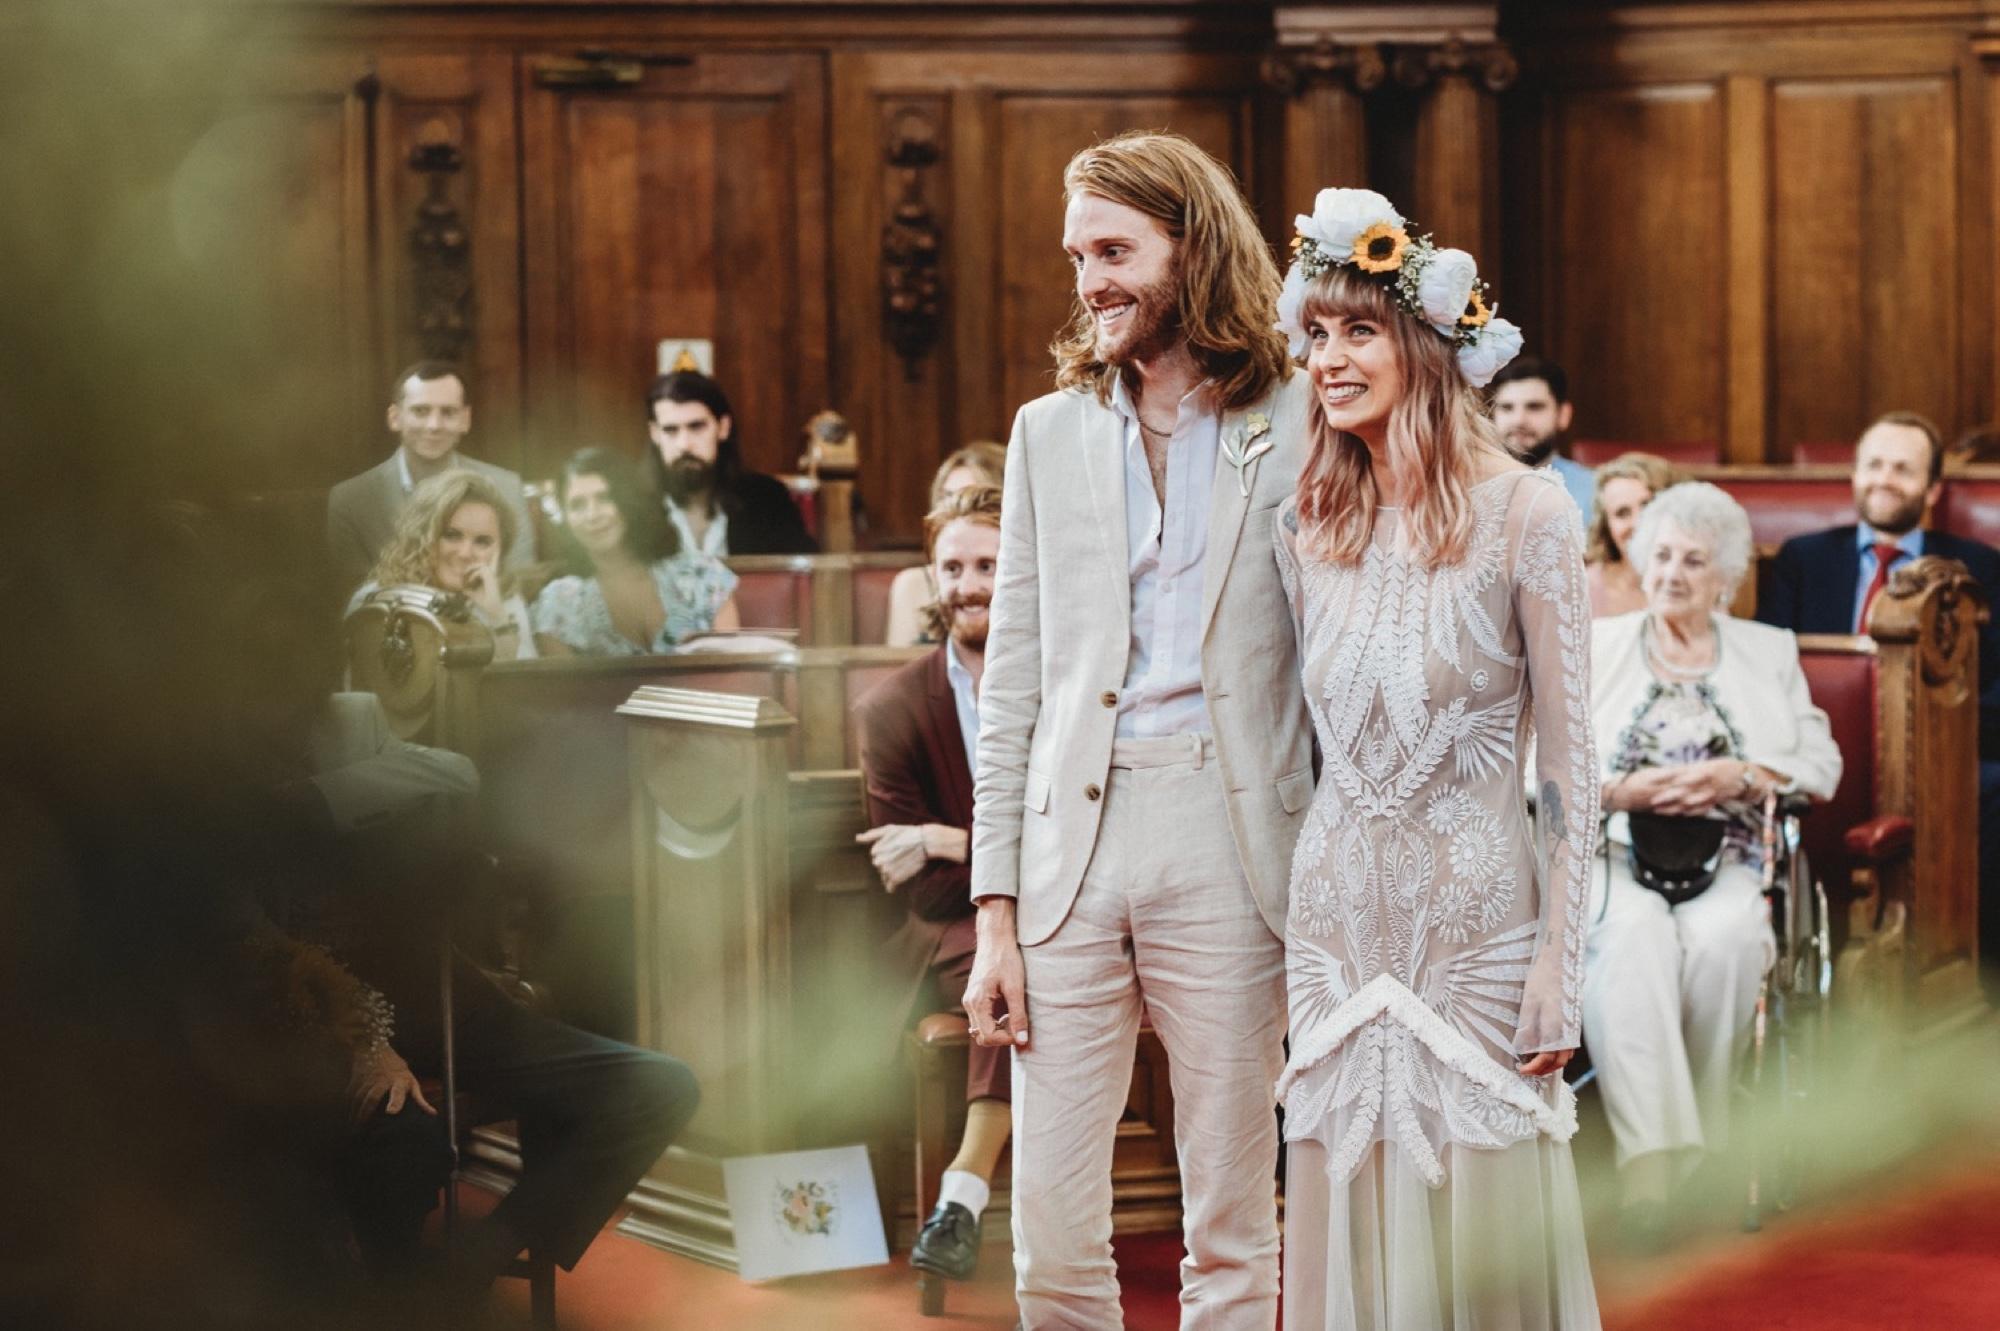 hackney London wedding ceremony by zakas photography